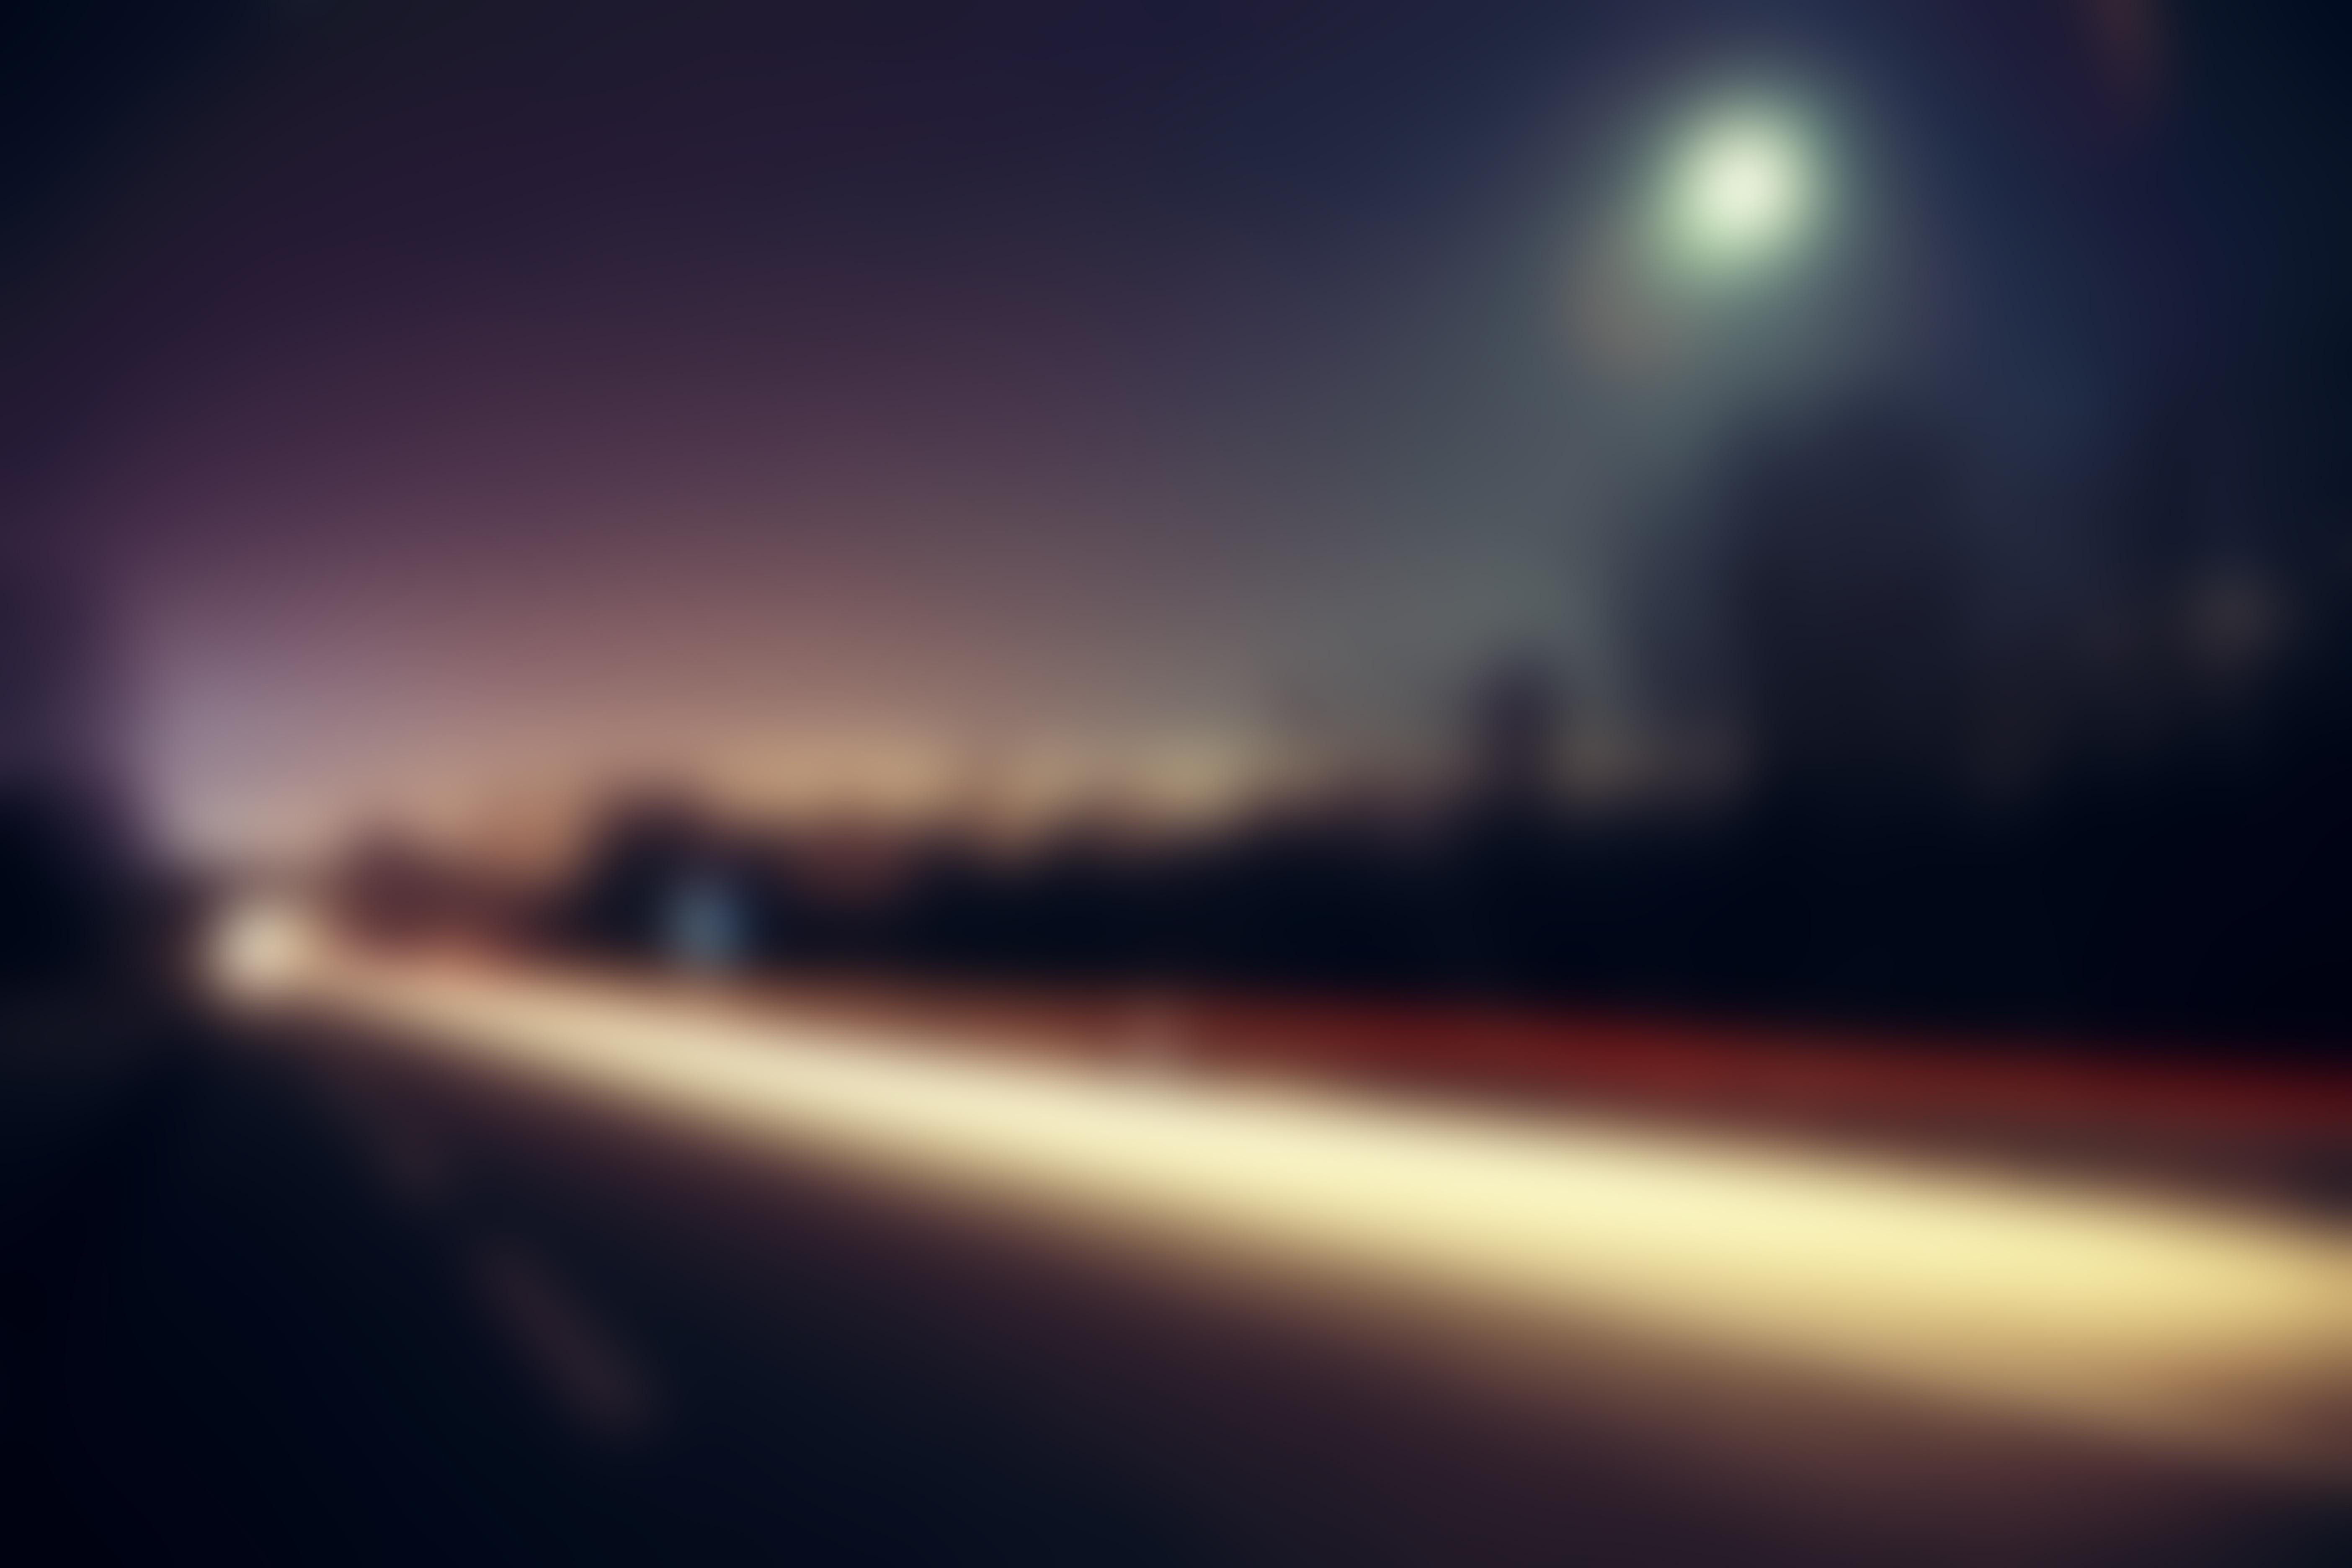 Road Street Blur Image